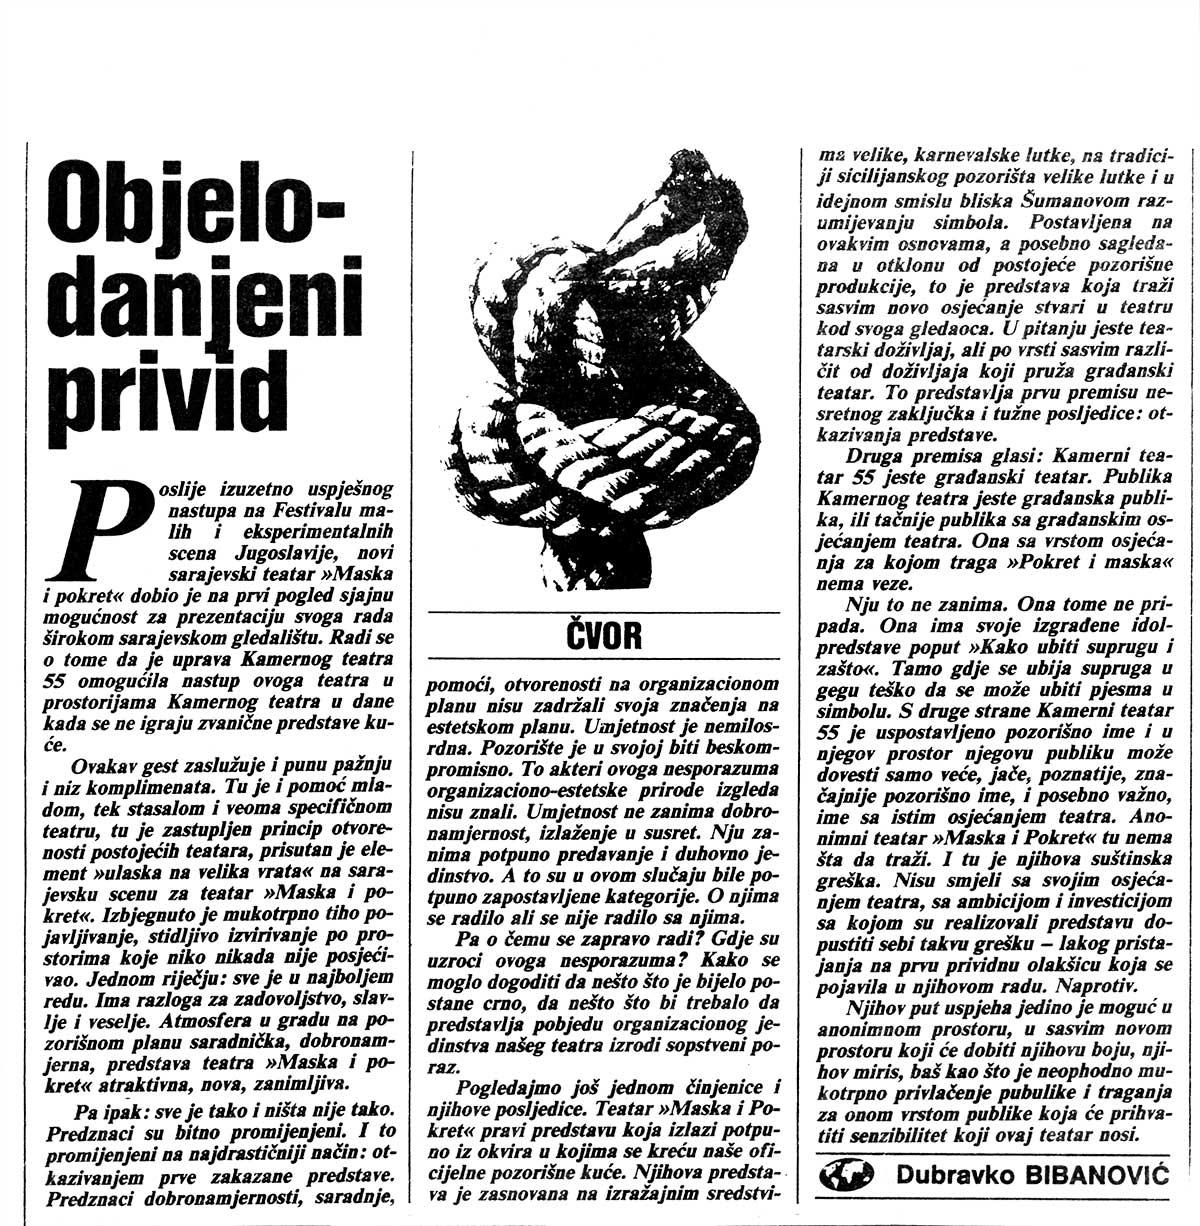 Press: Theatre Maska i Pokret - Somebody has Killed the Play - DISCLOSED DELUSION - Dubravko Bibanović